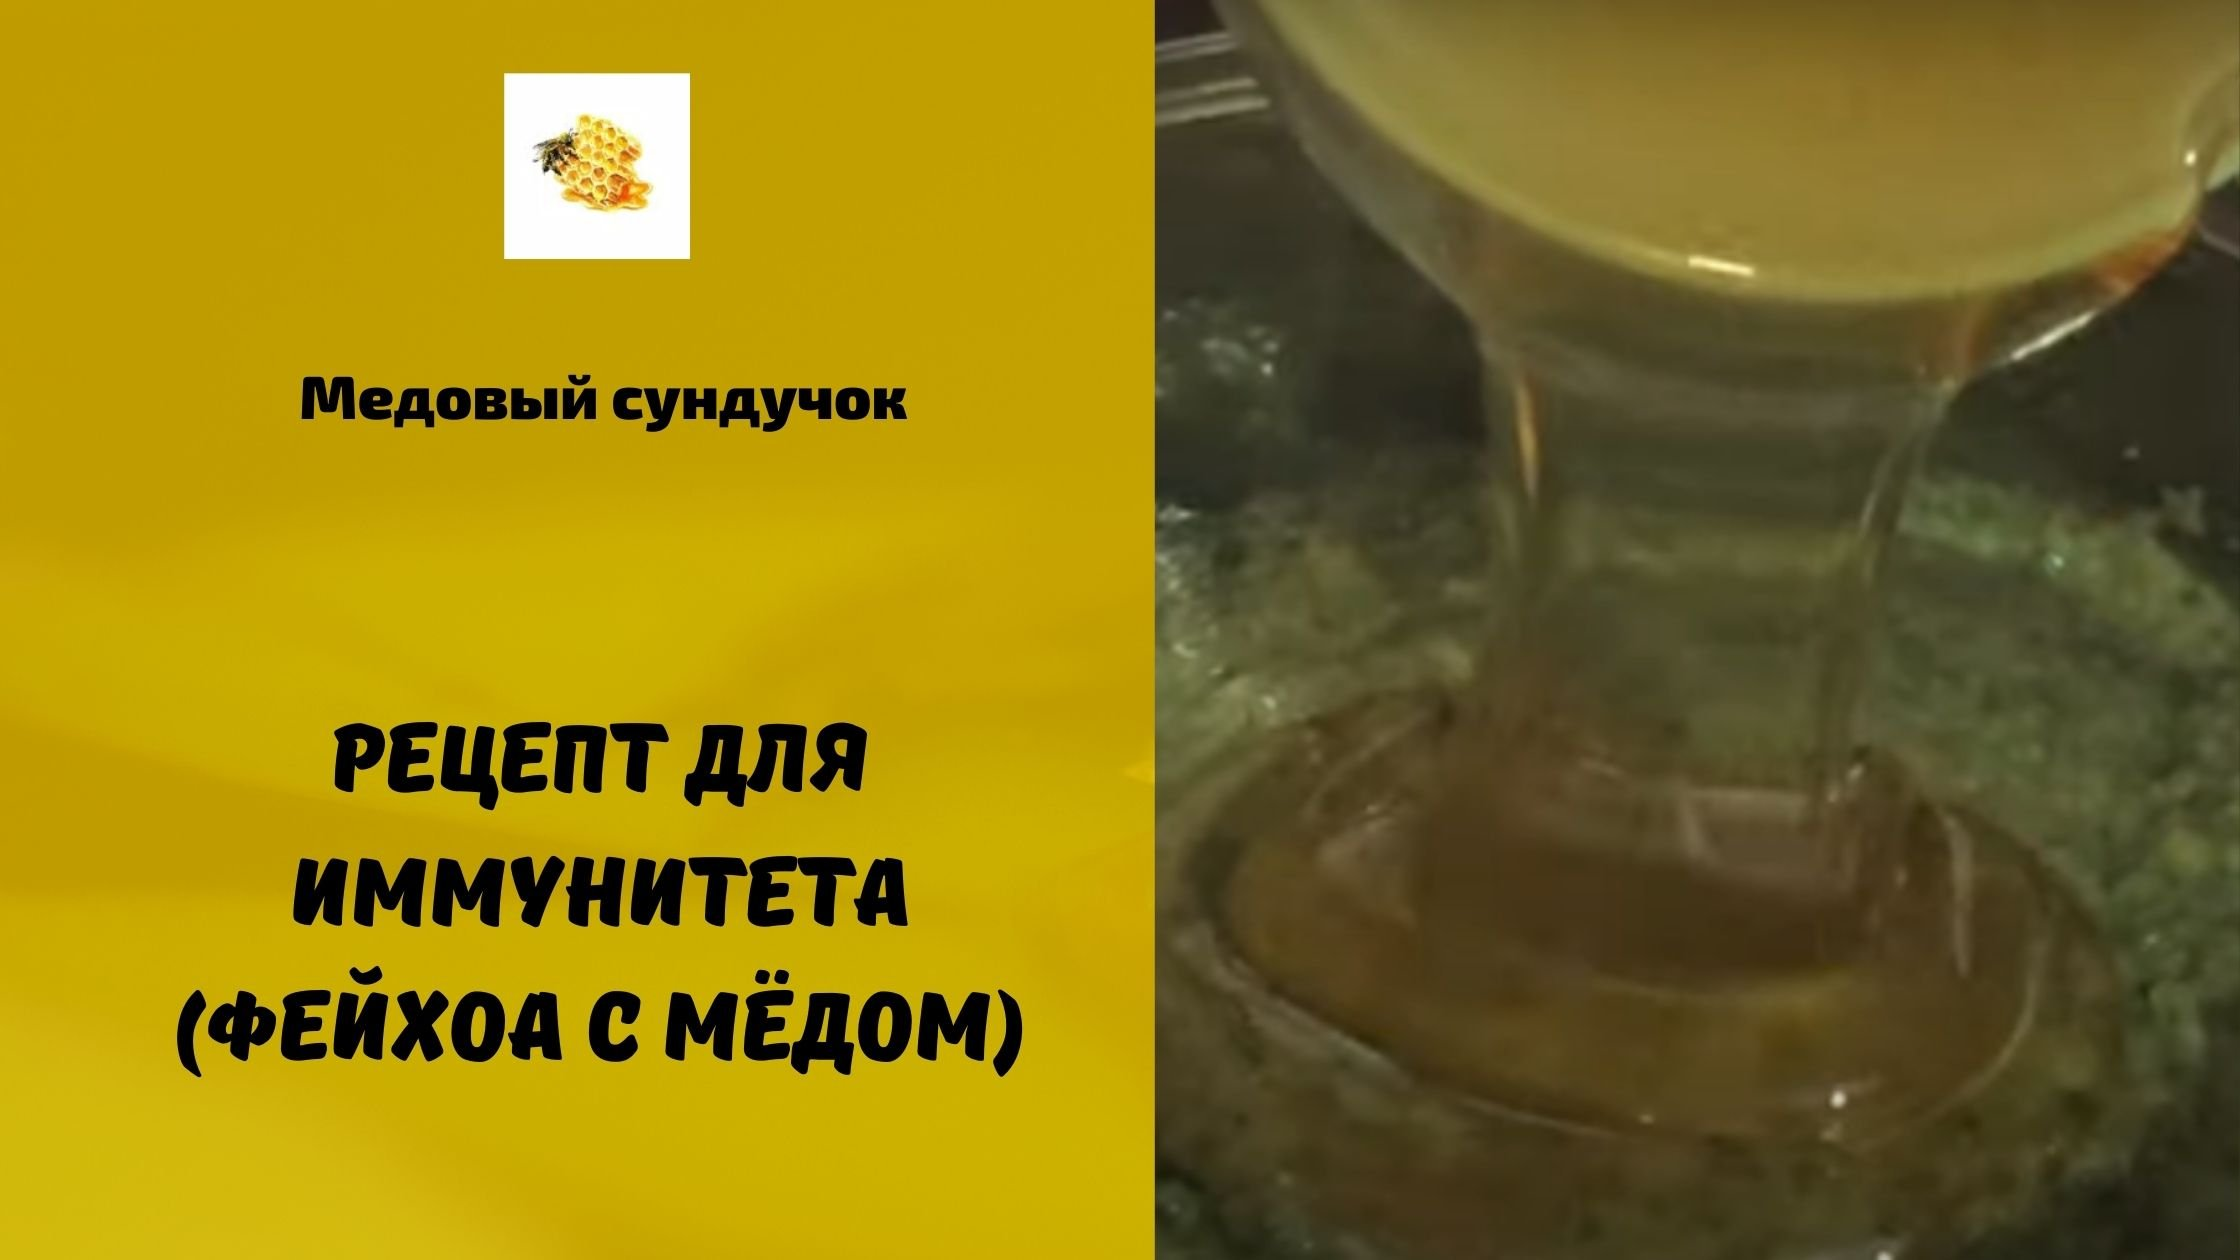 Рецепт для иммунитета(фейхоа с мёдом)